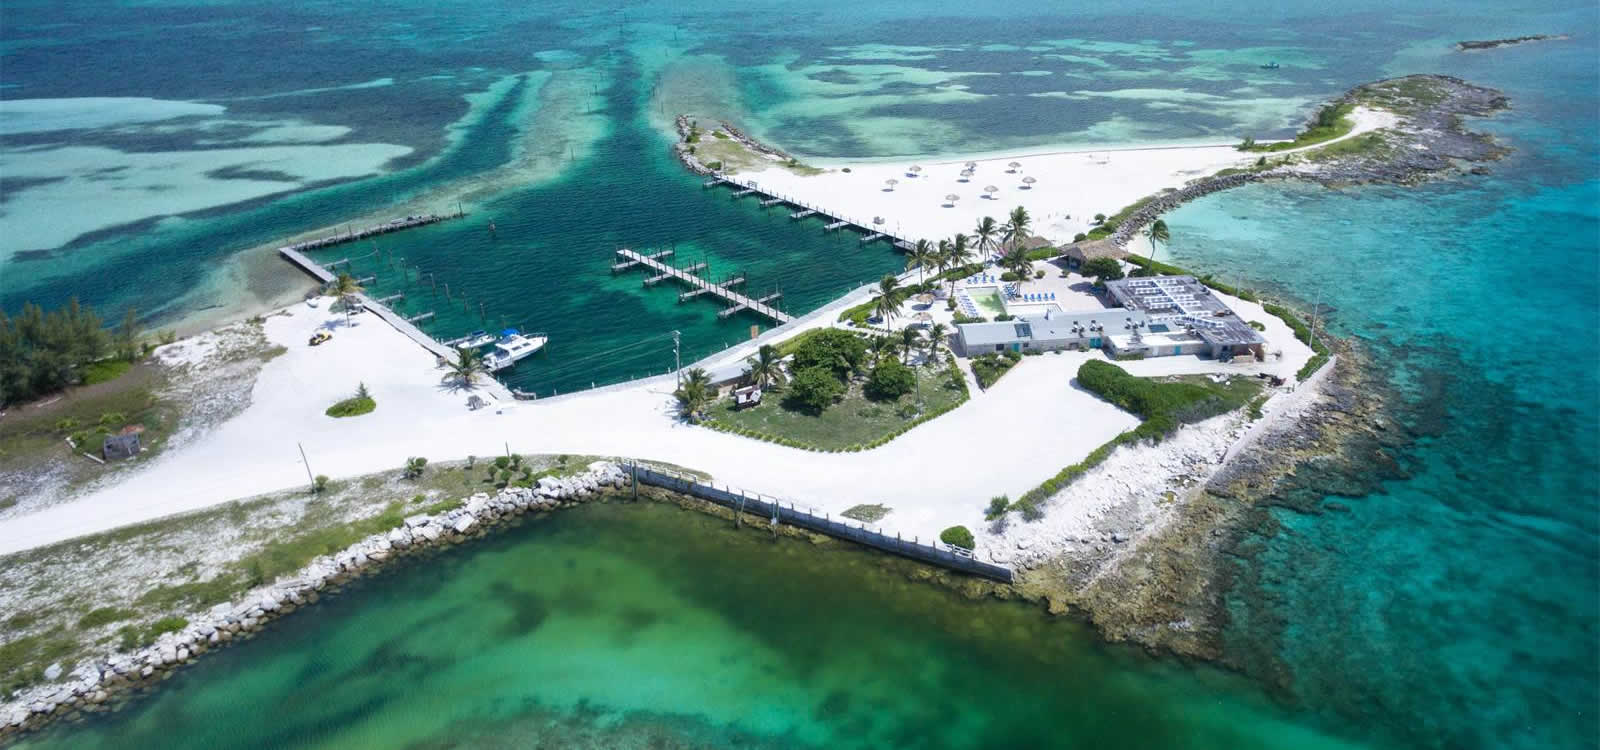 2 Acre Beach Amp Marina Resort For Sale Bimini Bahamas